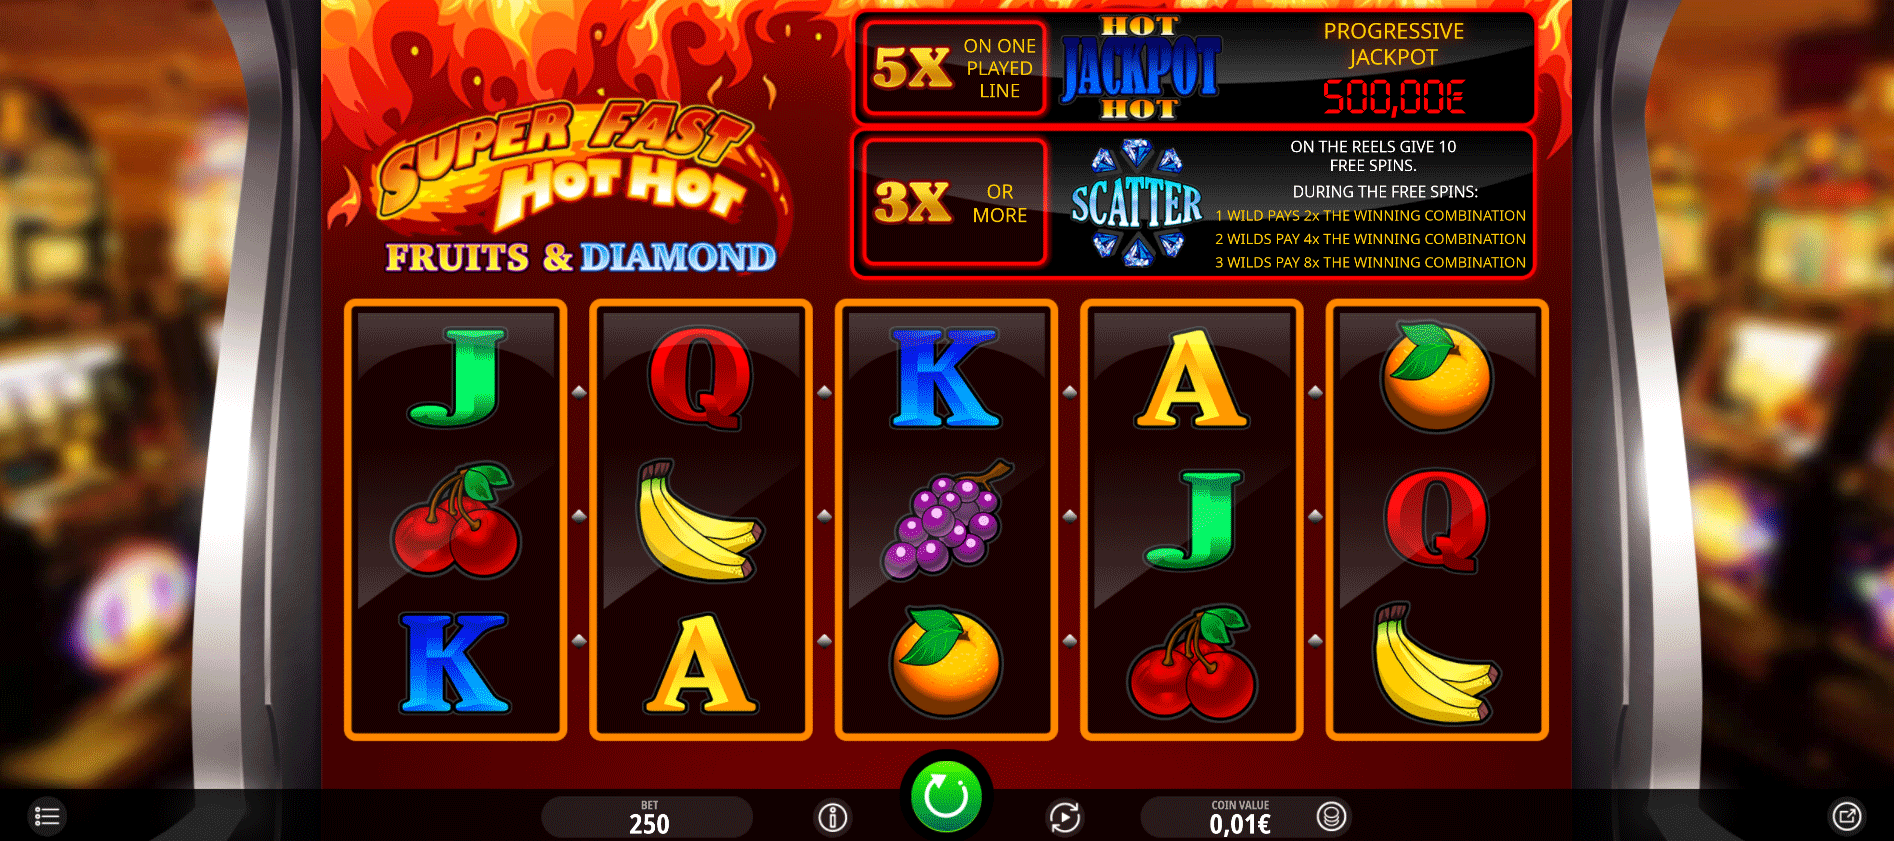 Slot Super Fast Hot Hot